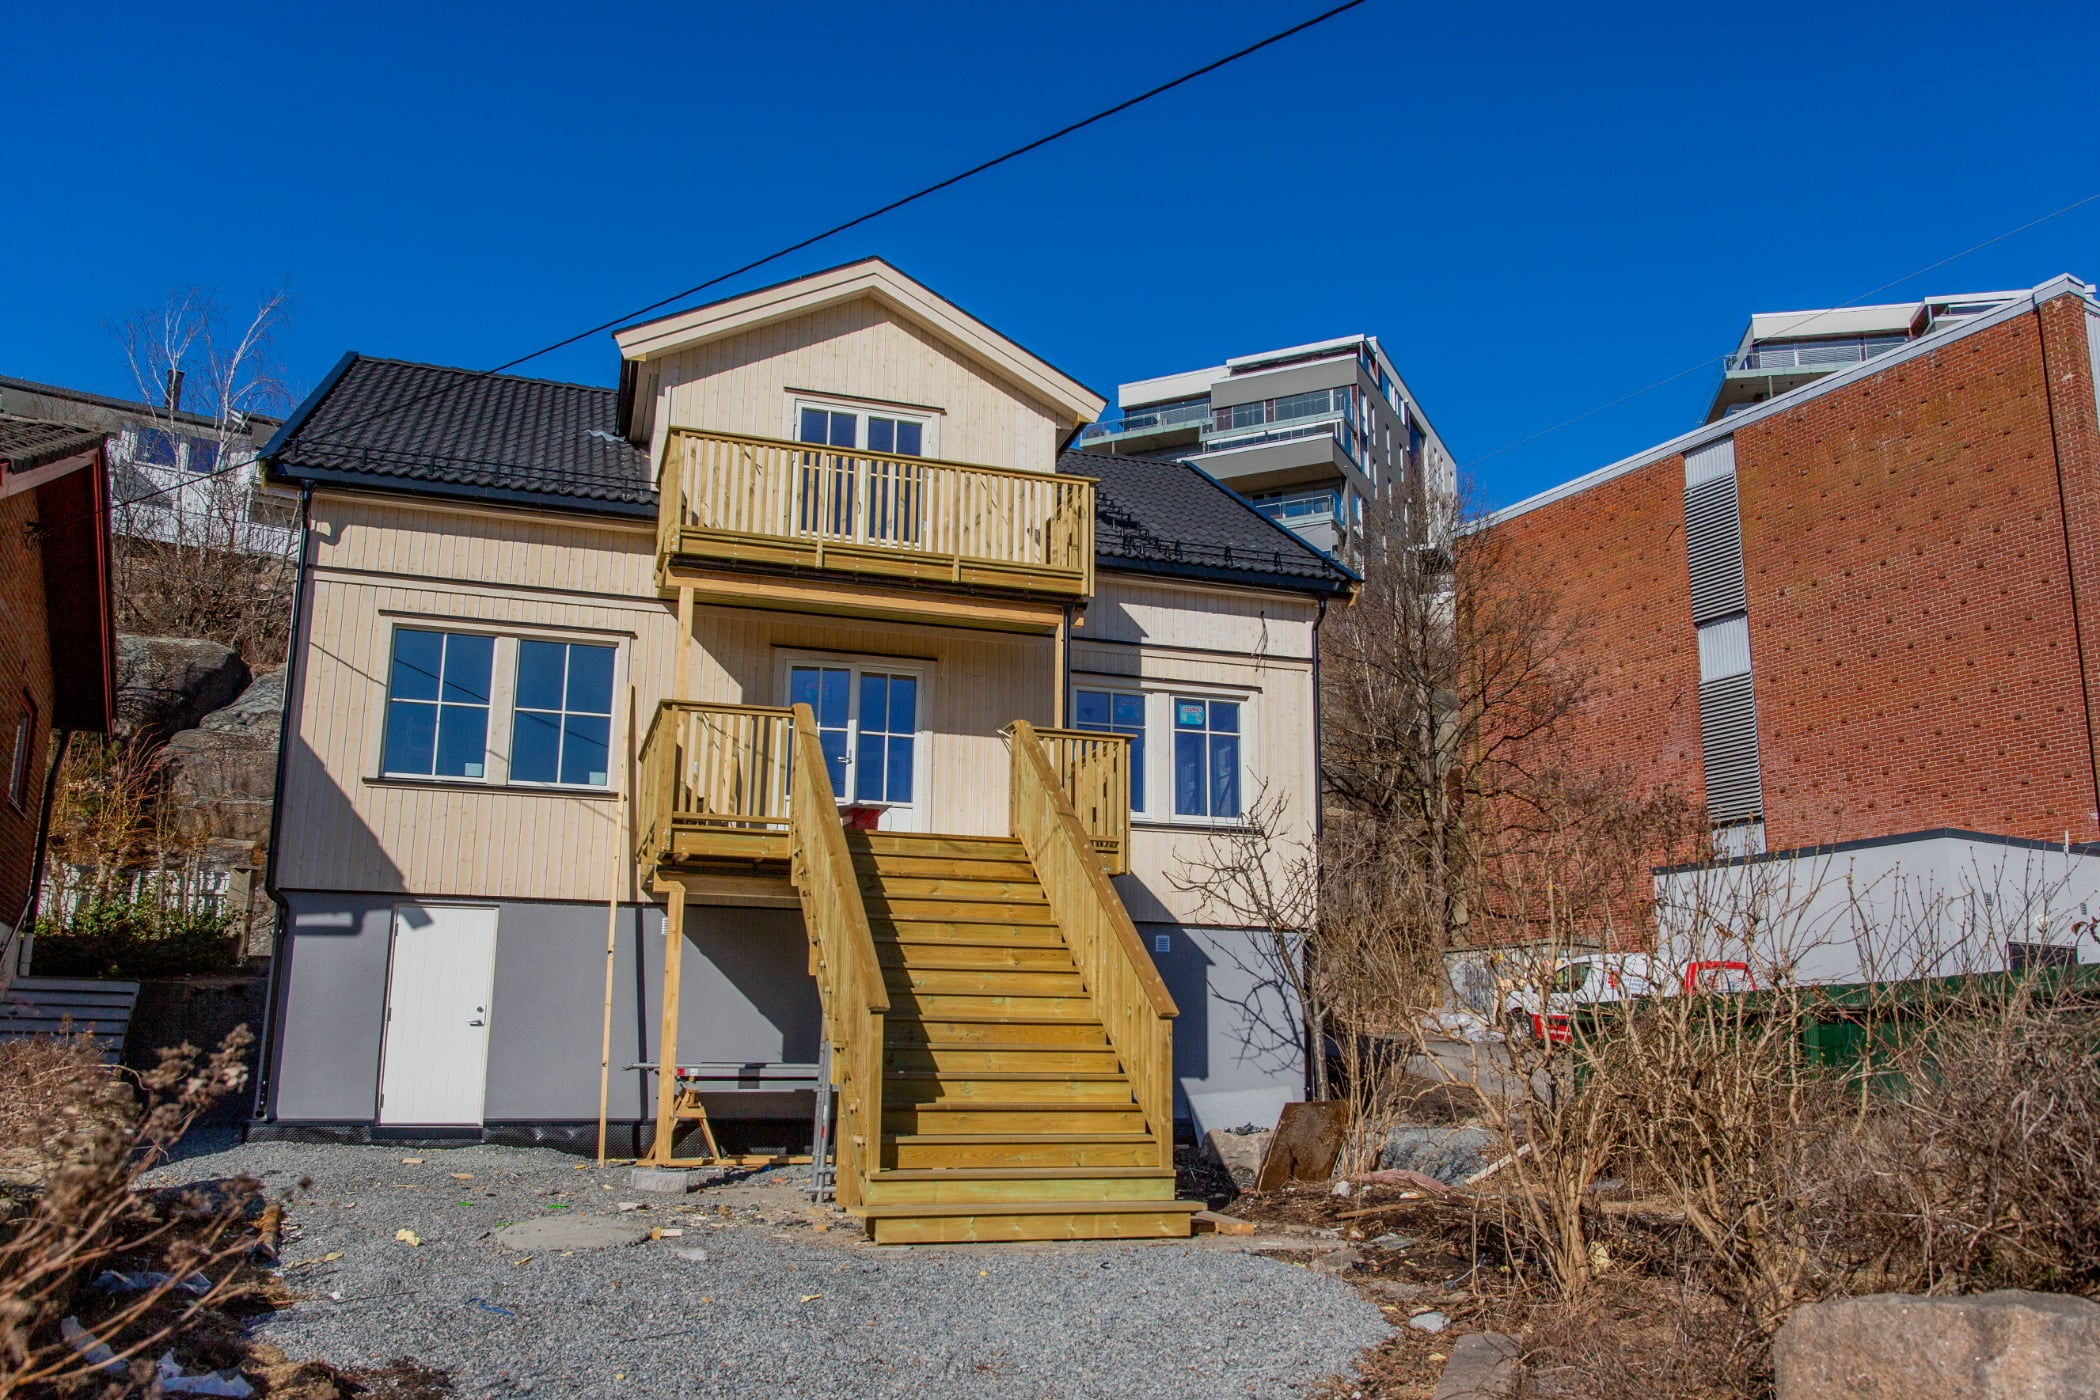 Land lot, Sky, Plant, Window, Building, Fixture, Door, House, Stairs, Wood